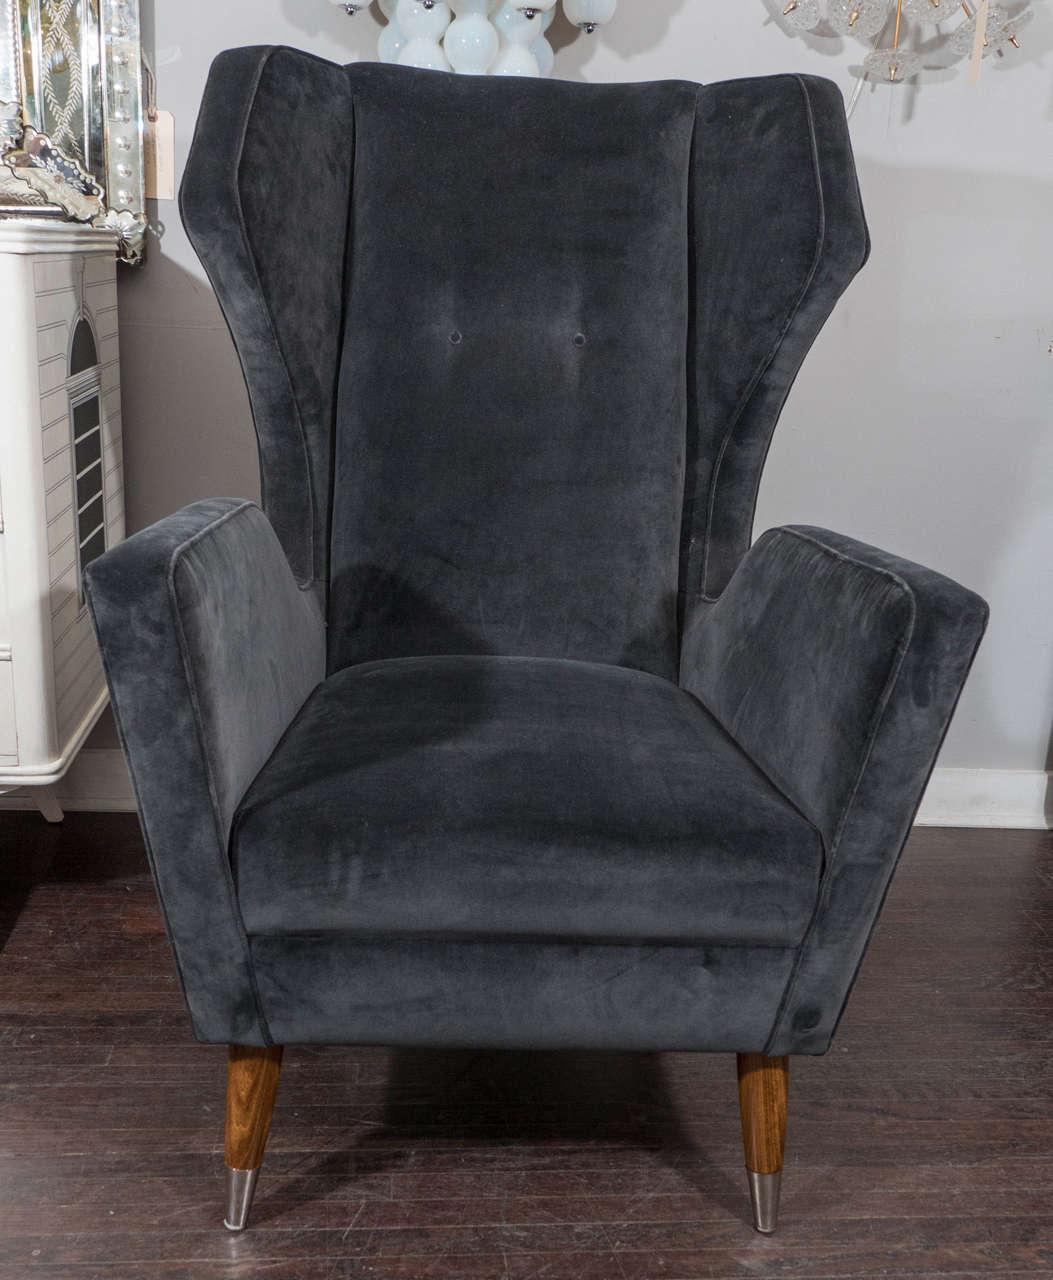 Custom Gio Ponti Style Chair and Ottoman For Sale 2